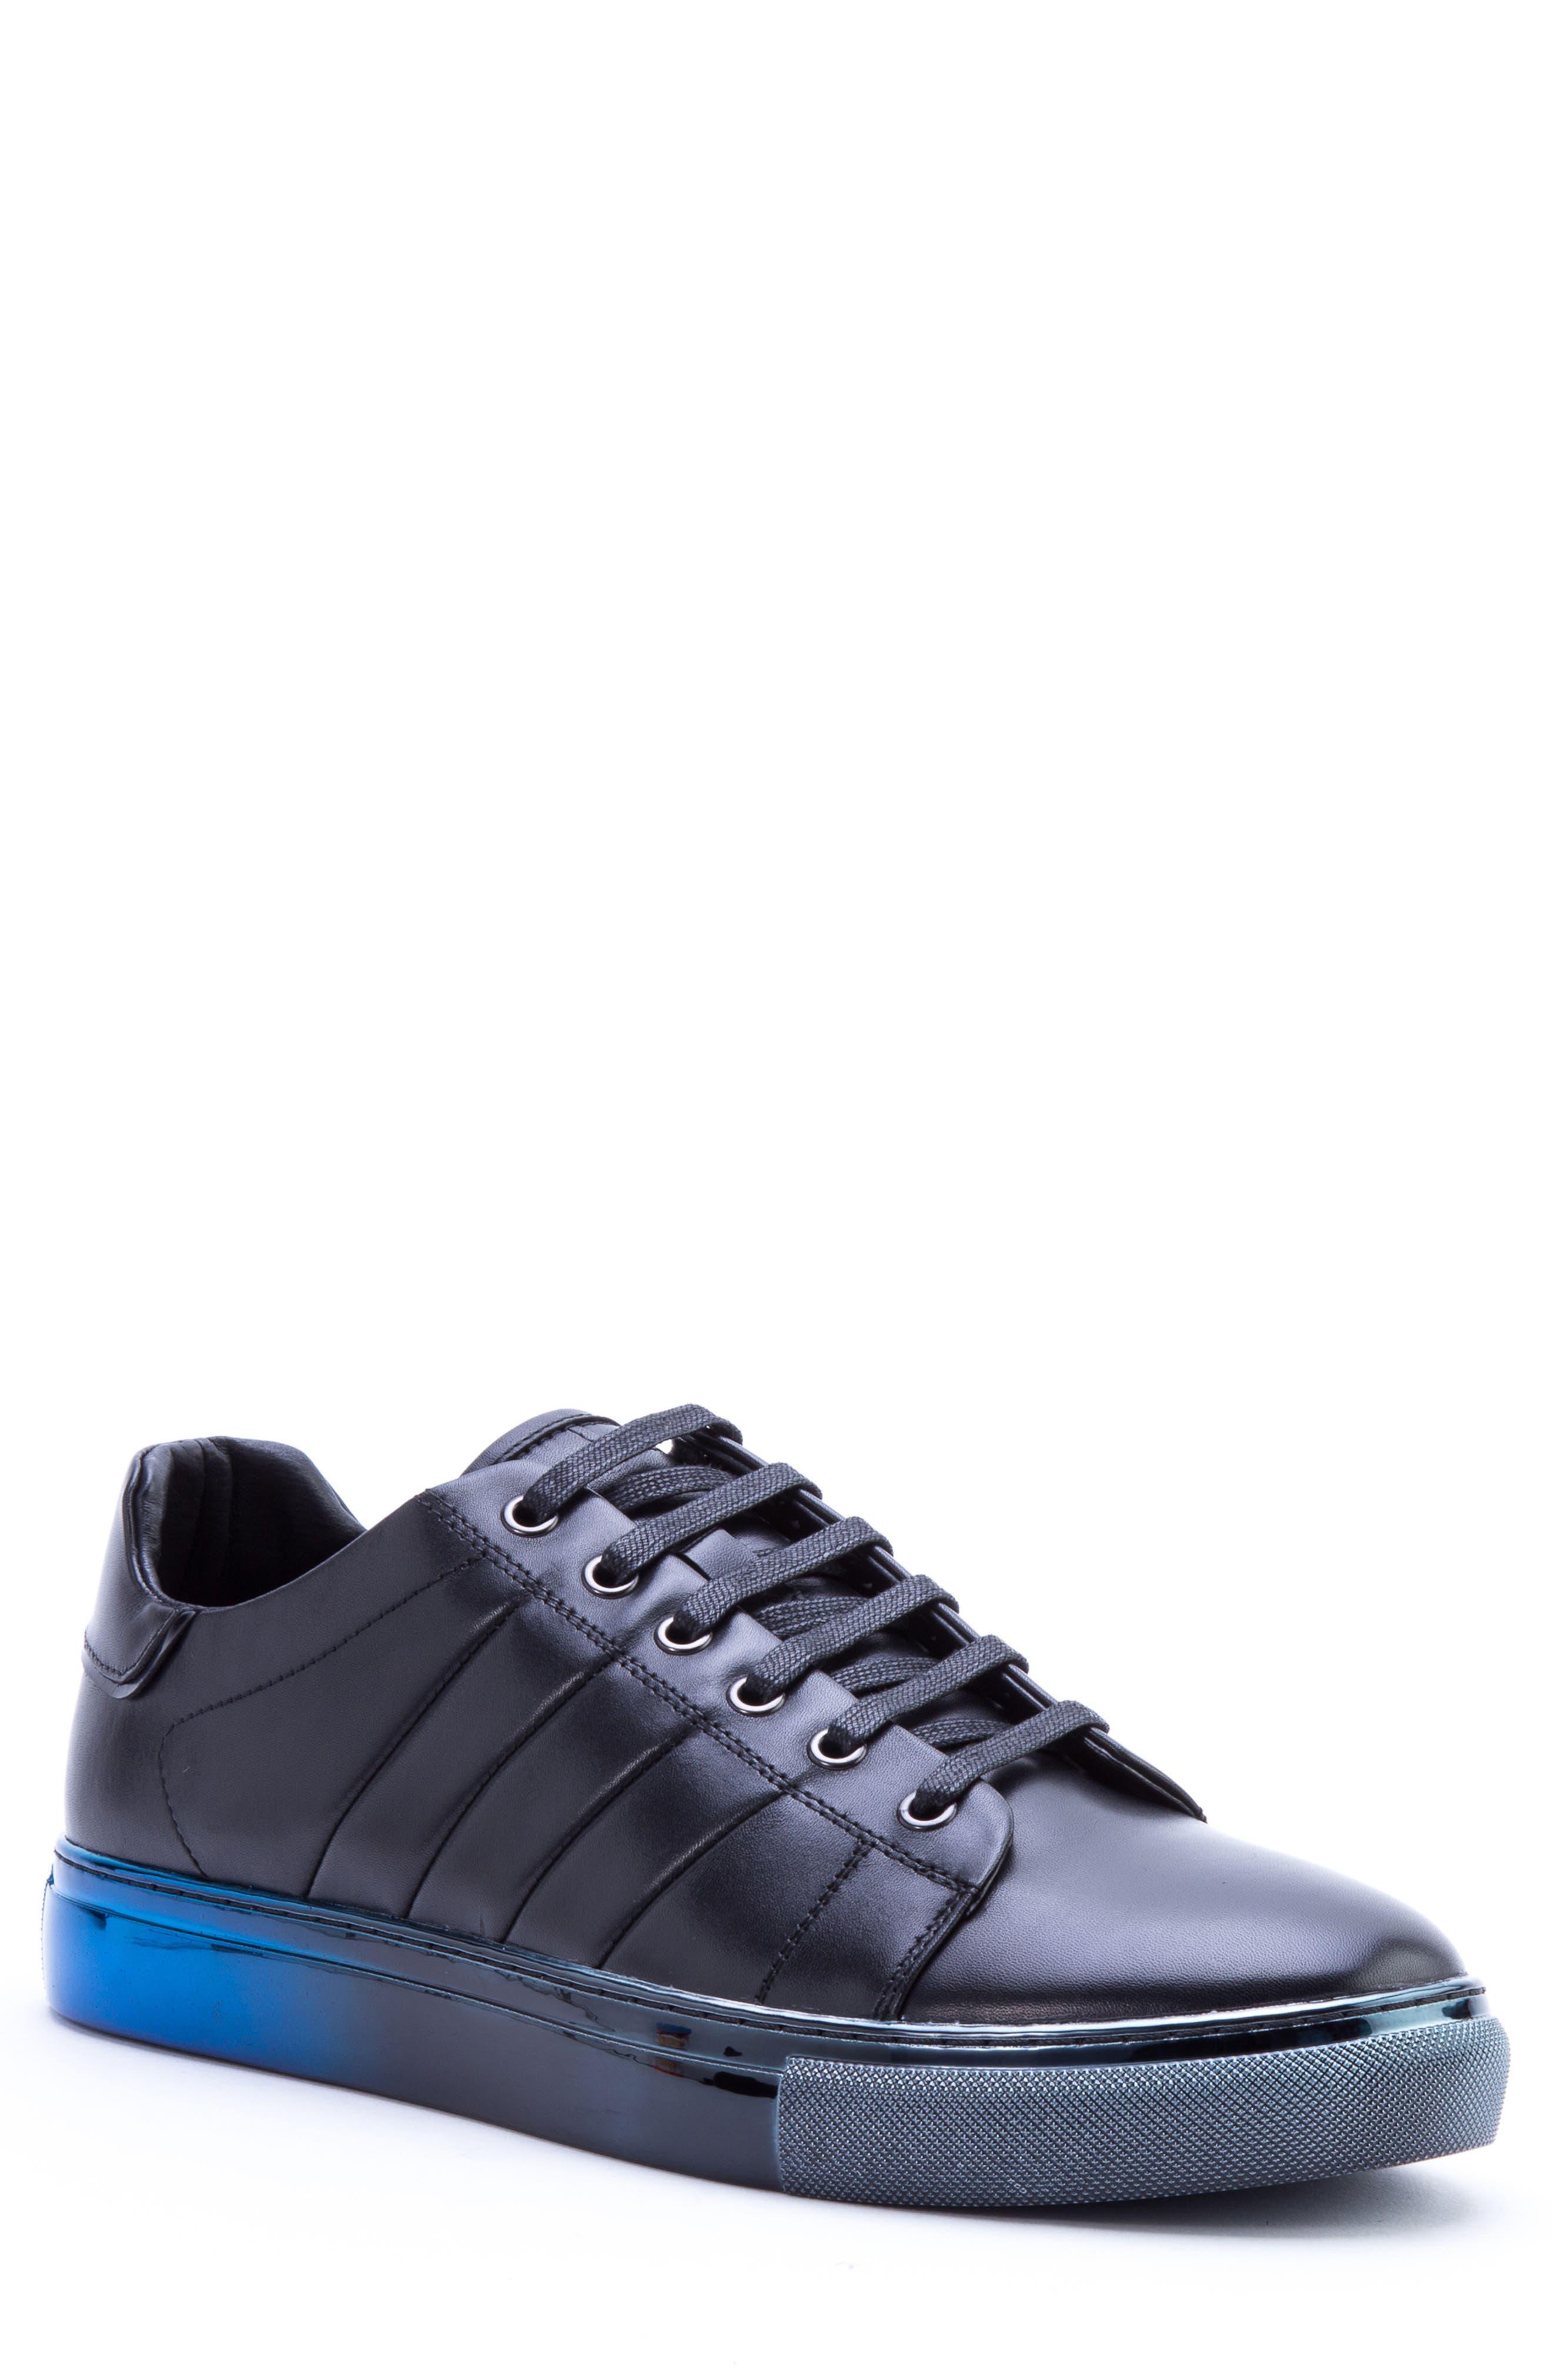 Badgley Mischka Brando Sneaker, Black